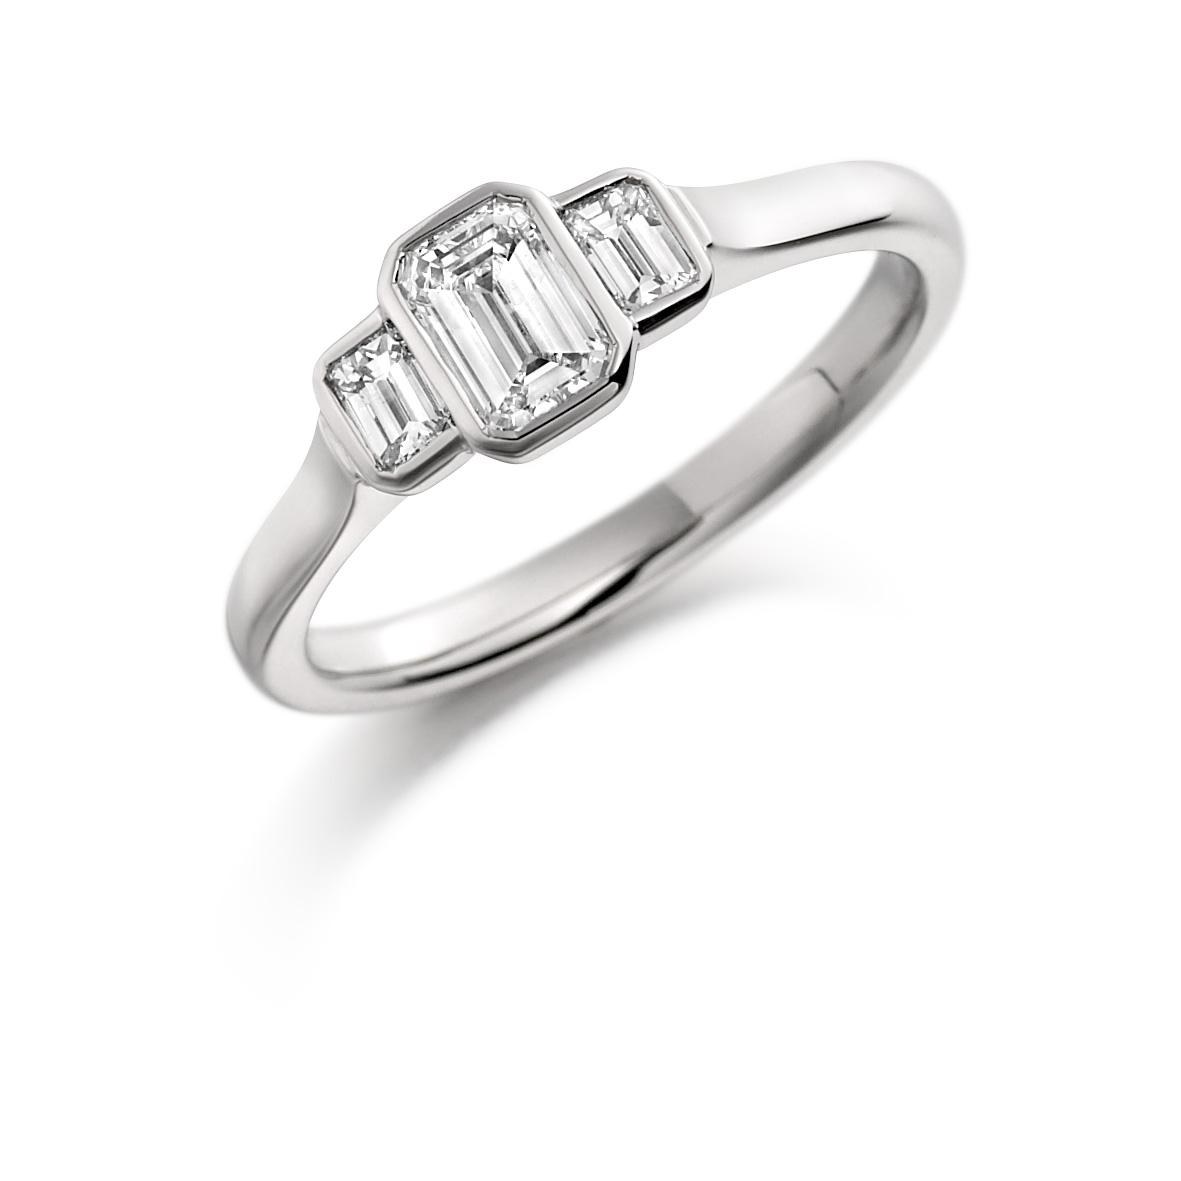 A Beautiful Platinum Three Stone Diamond Ring